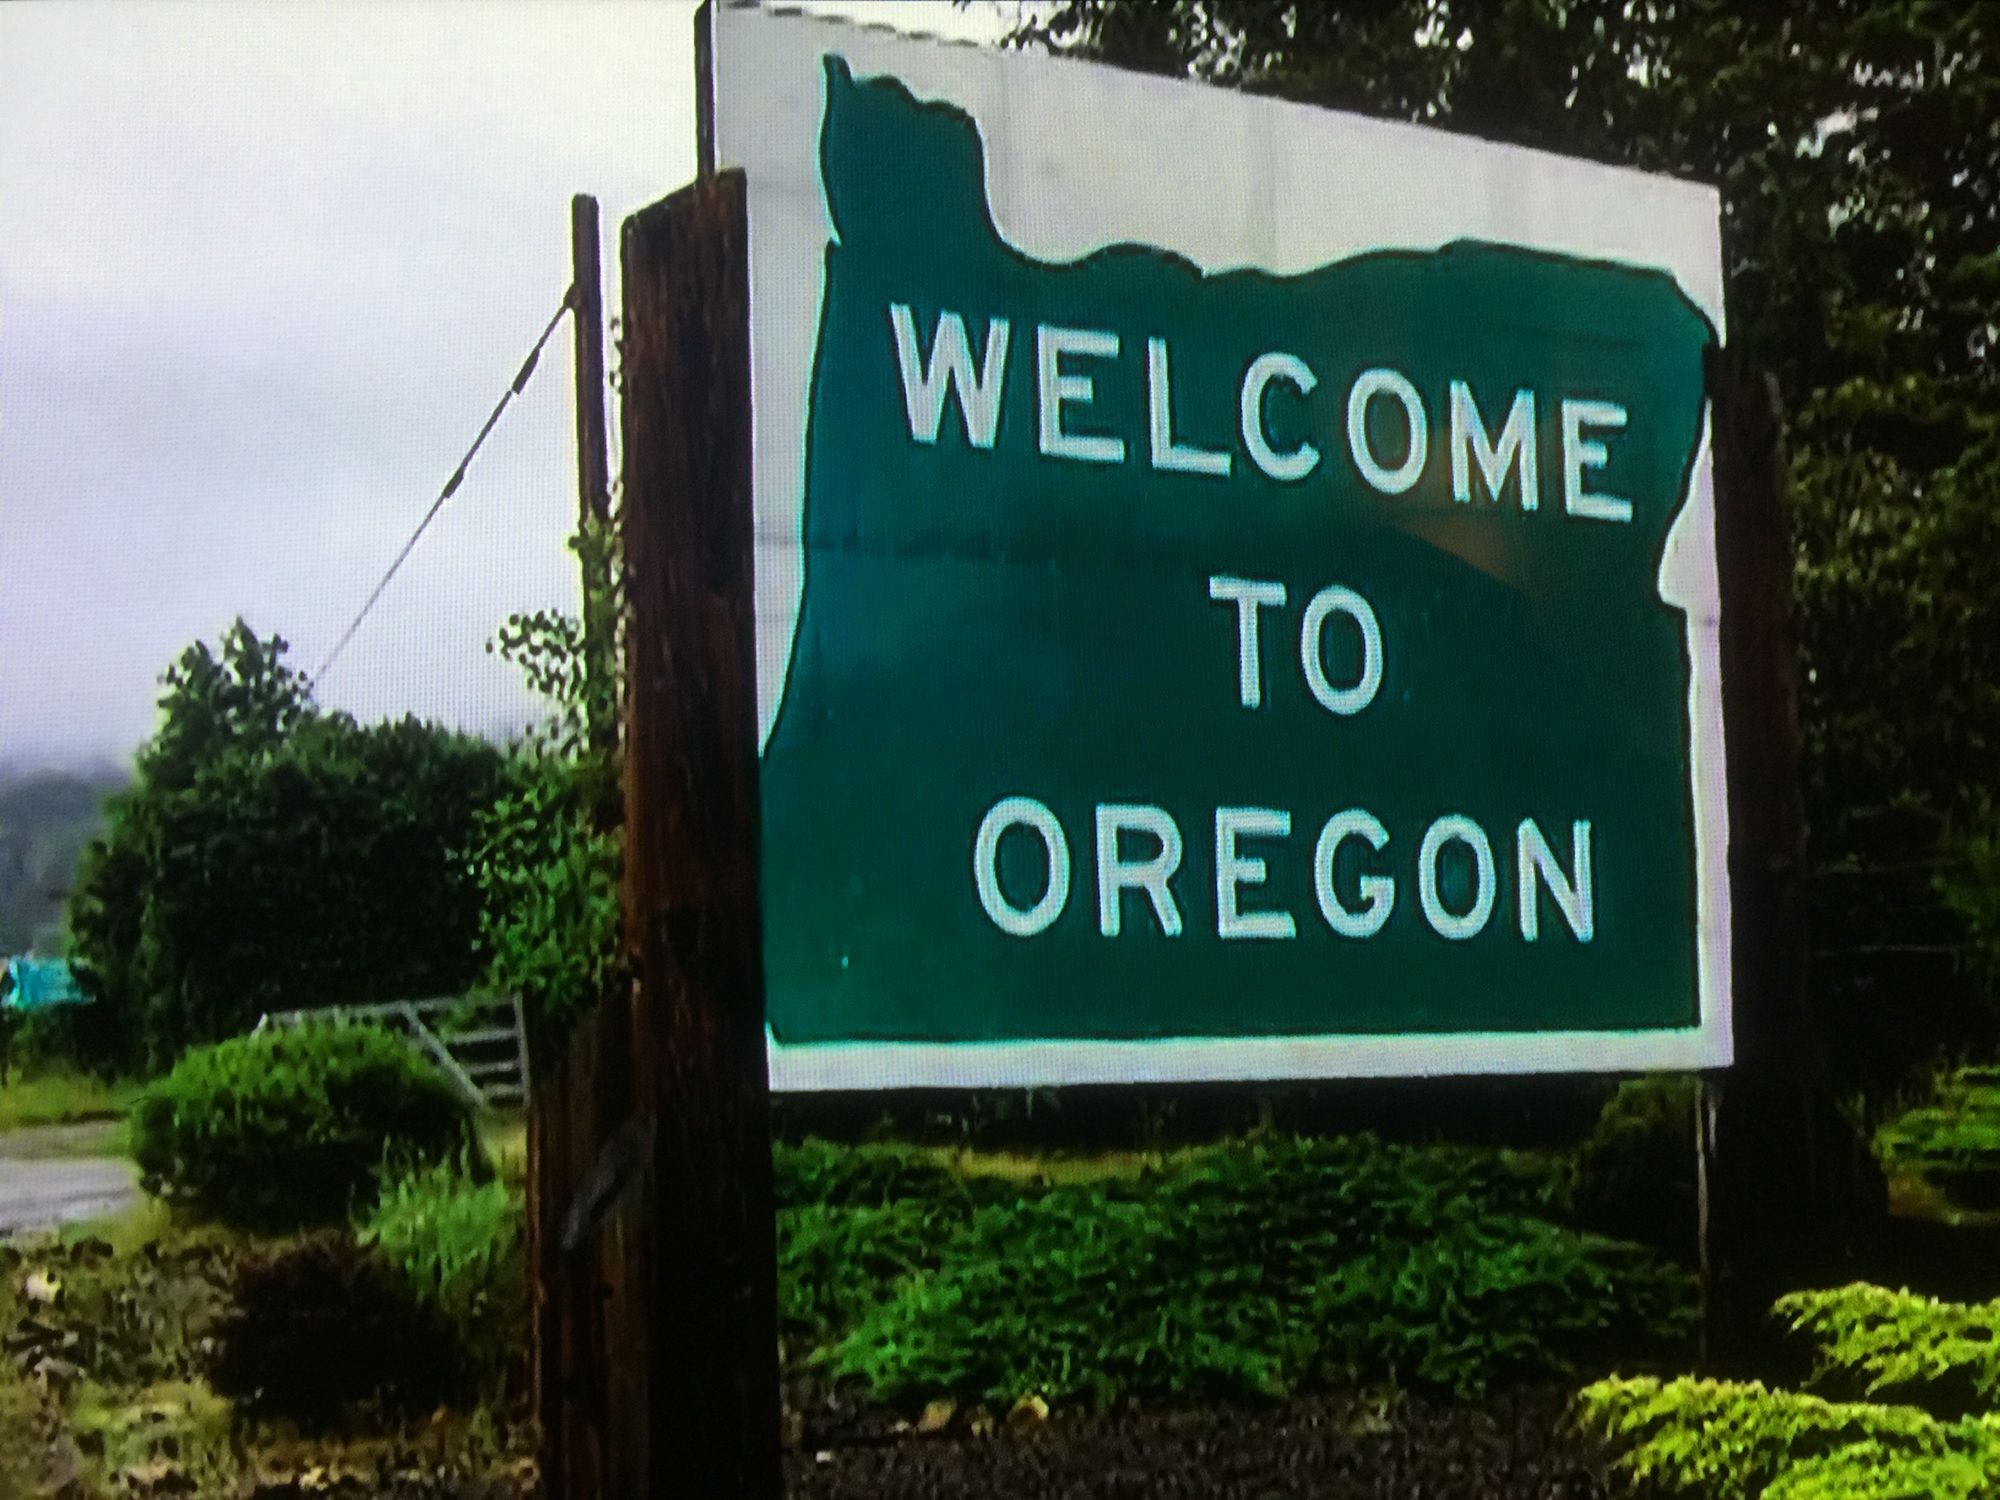 The Oregon - California border along Interstate 101